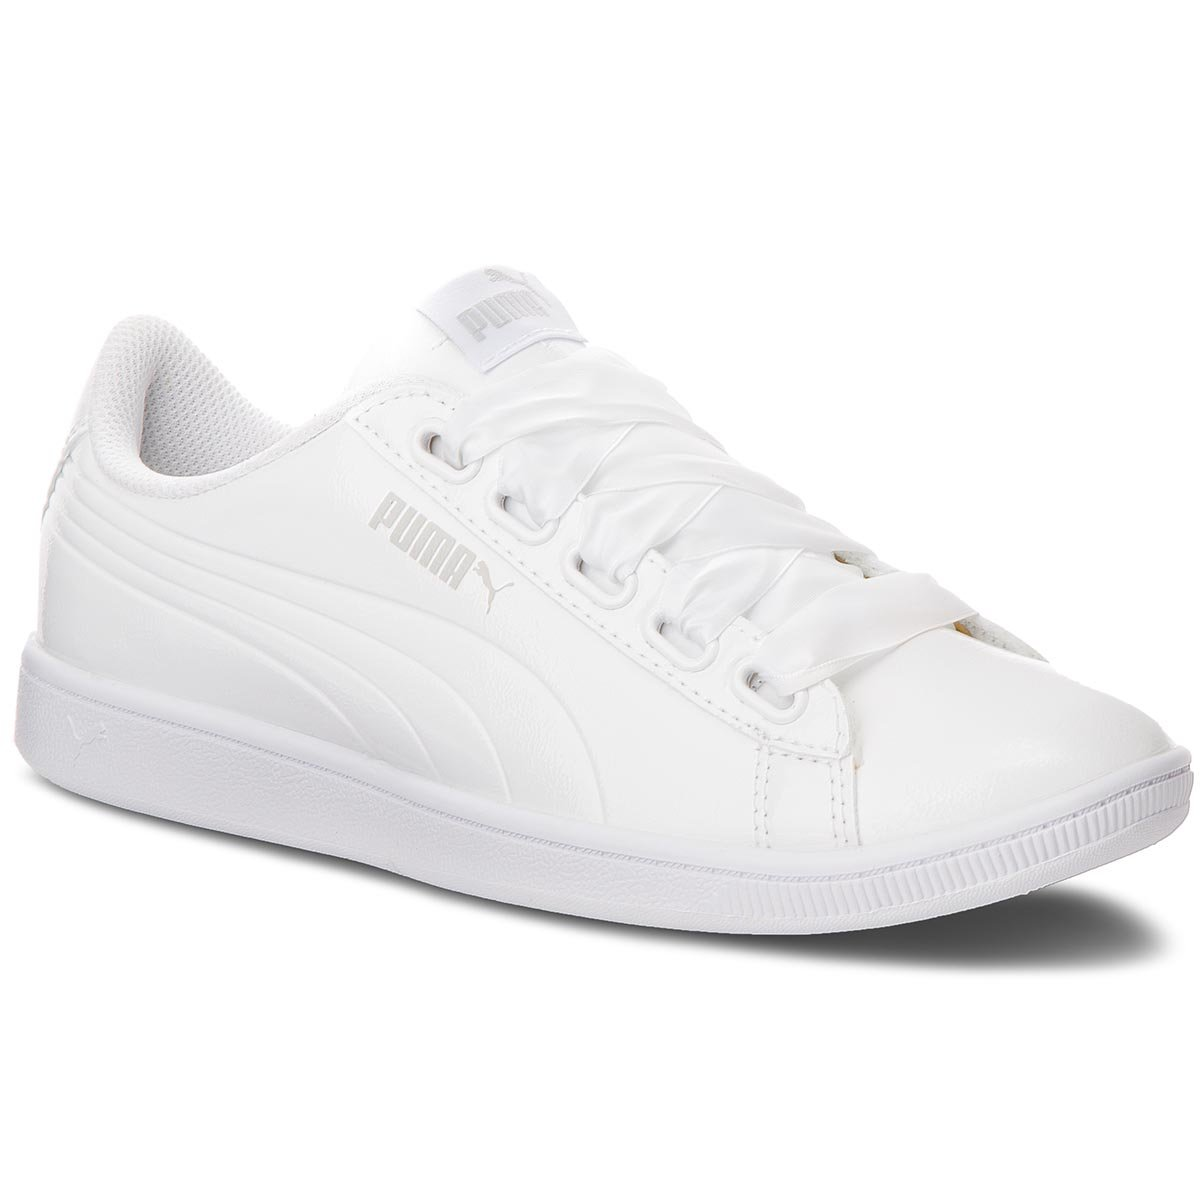 Pantofi sport Puma 36641702 Vikky Ribbon P Alb Femei 38